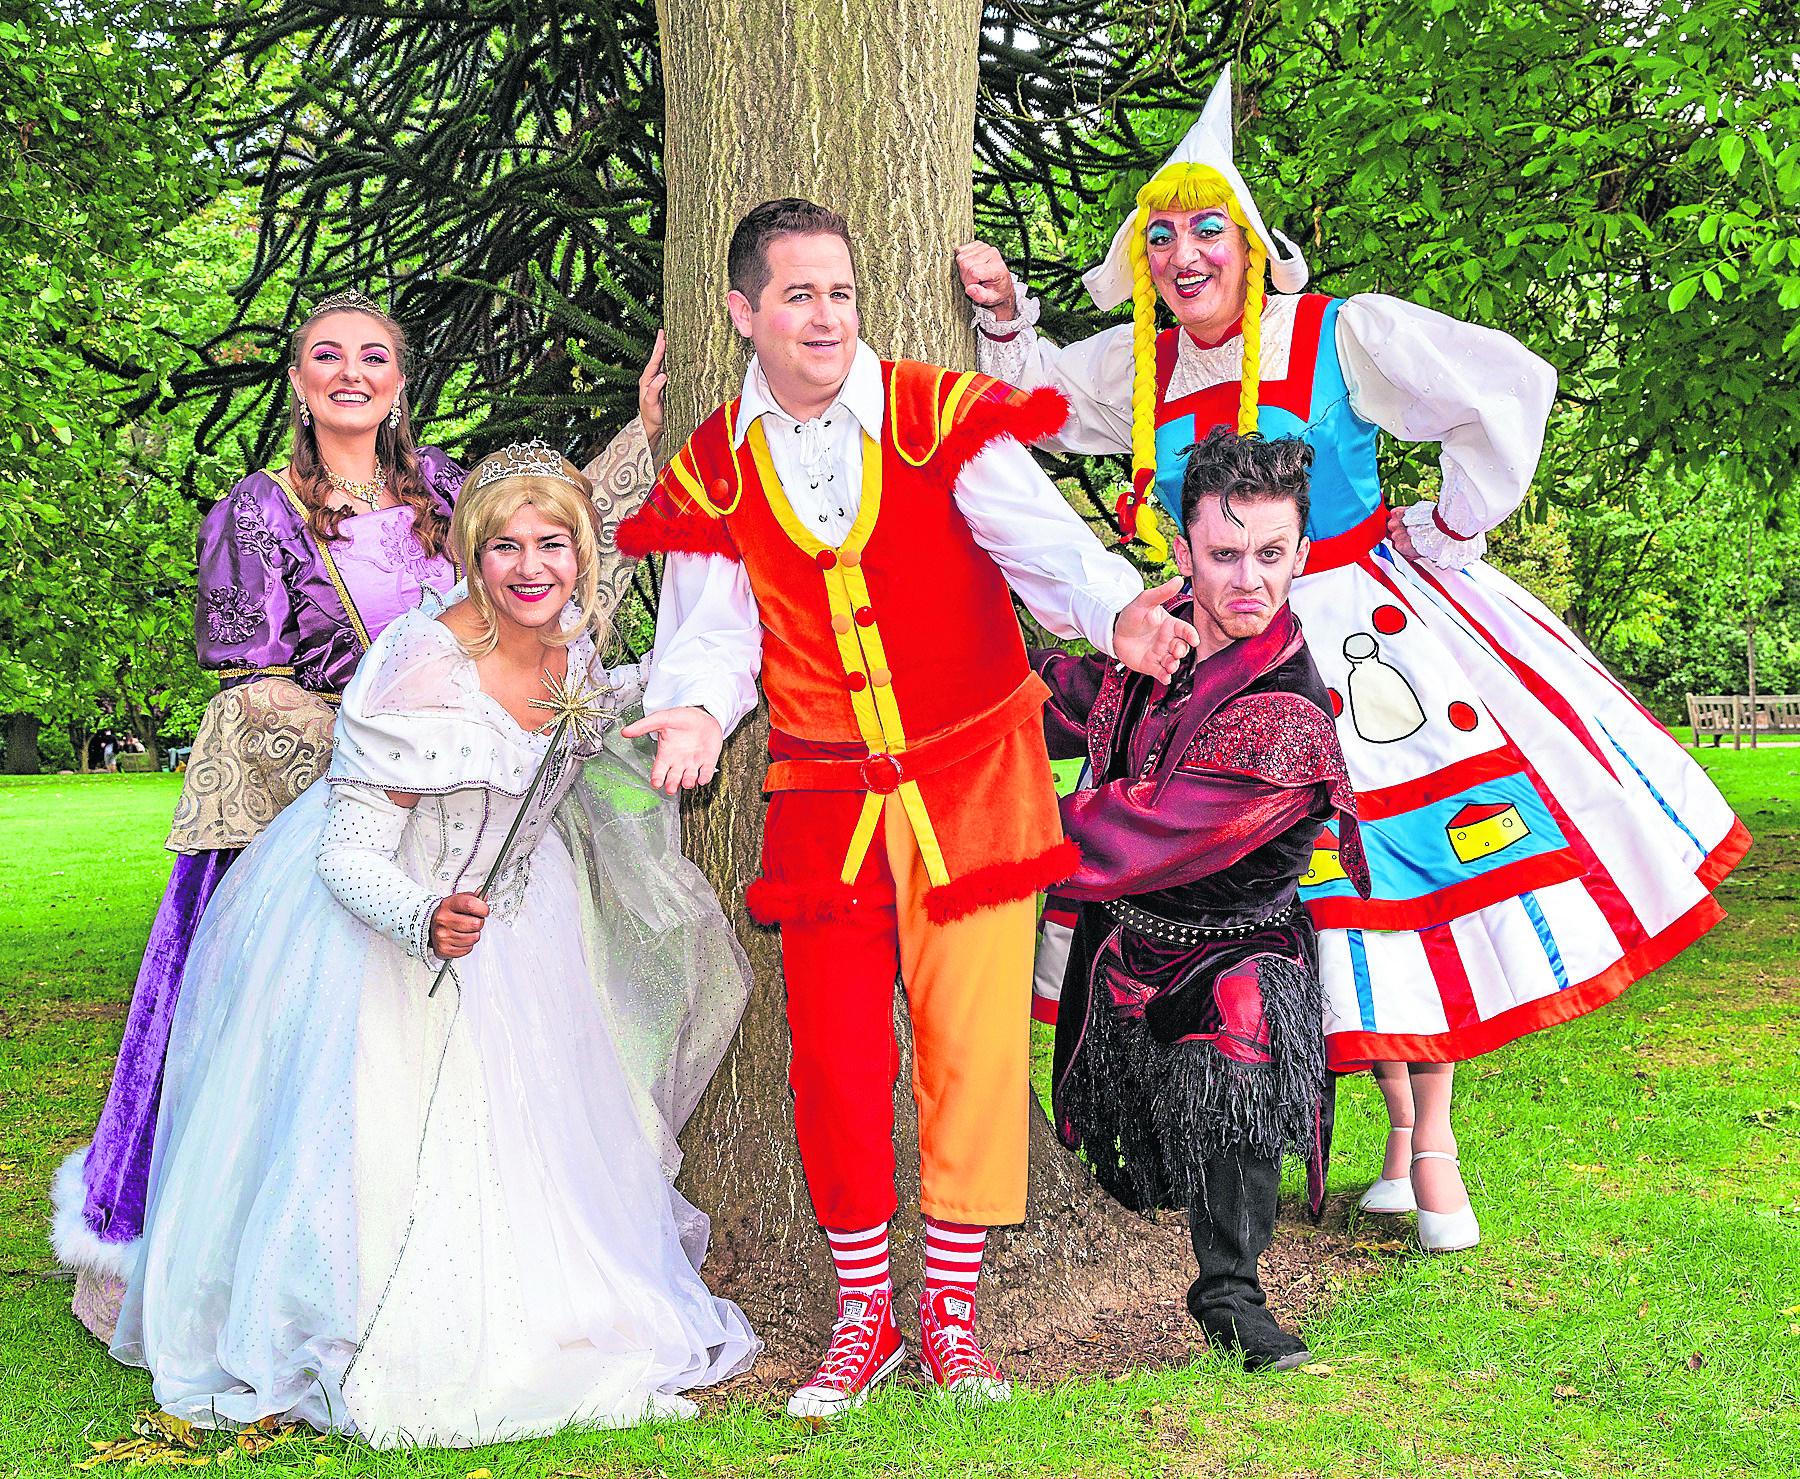 Steven Wren as Dame Trot Ross Allan as Jack Jennifer Neil as Jill Chris O'Mara as the villainous Fleshcreep  Marj Hogarth as the fairy